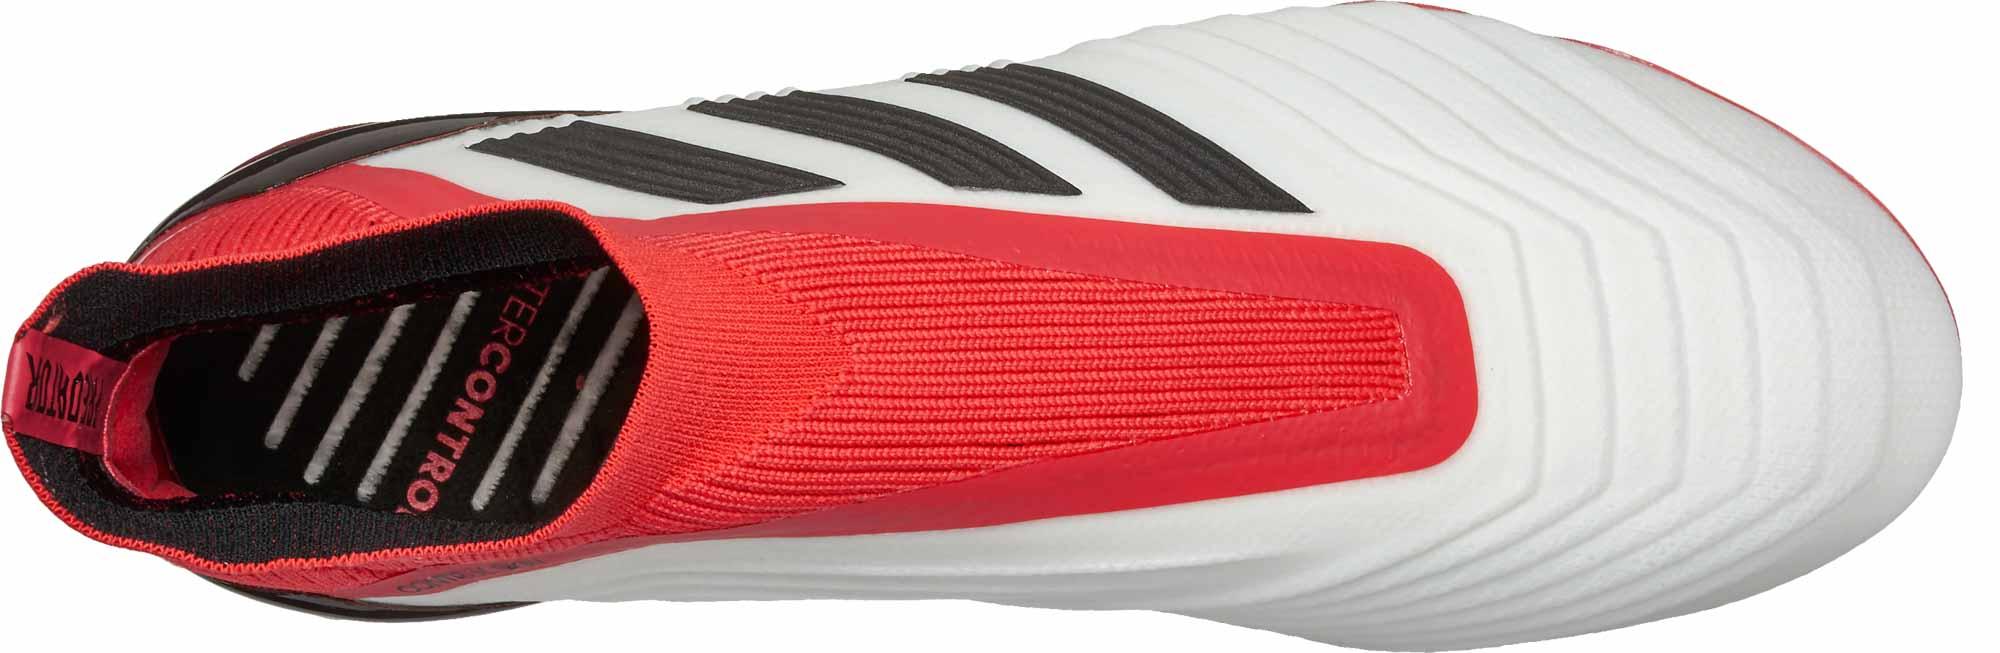 Adidas Predator 18 Pluss C6j1O